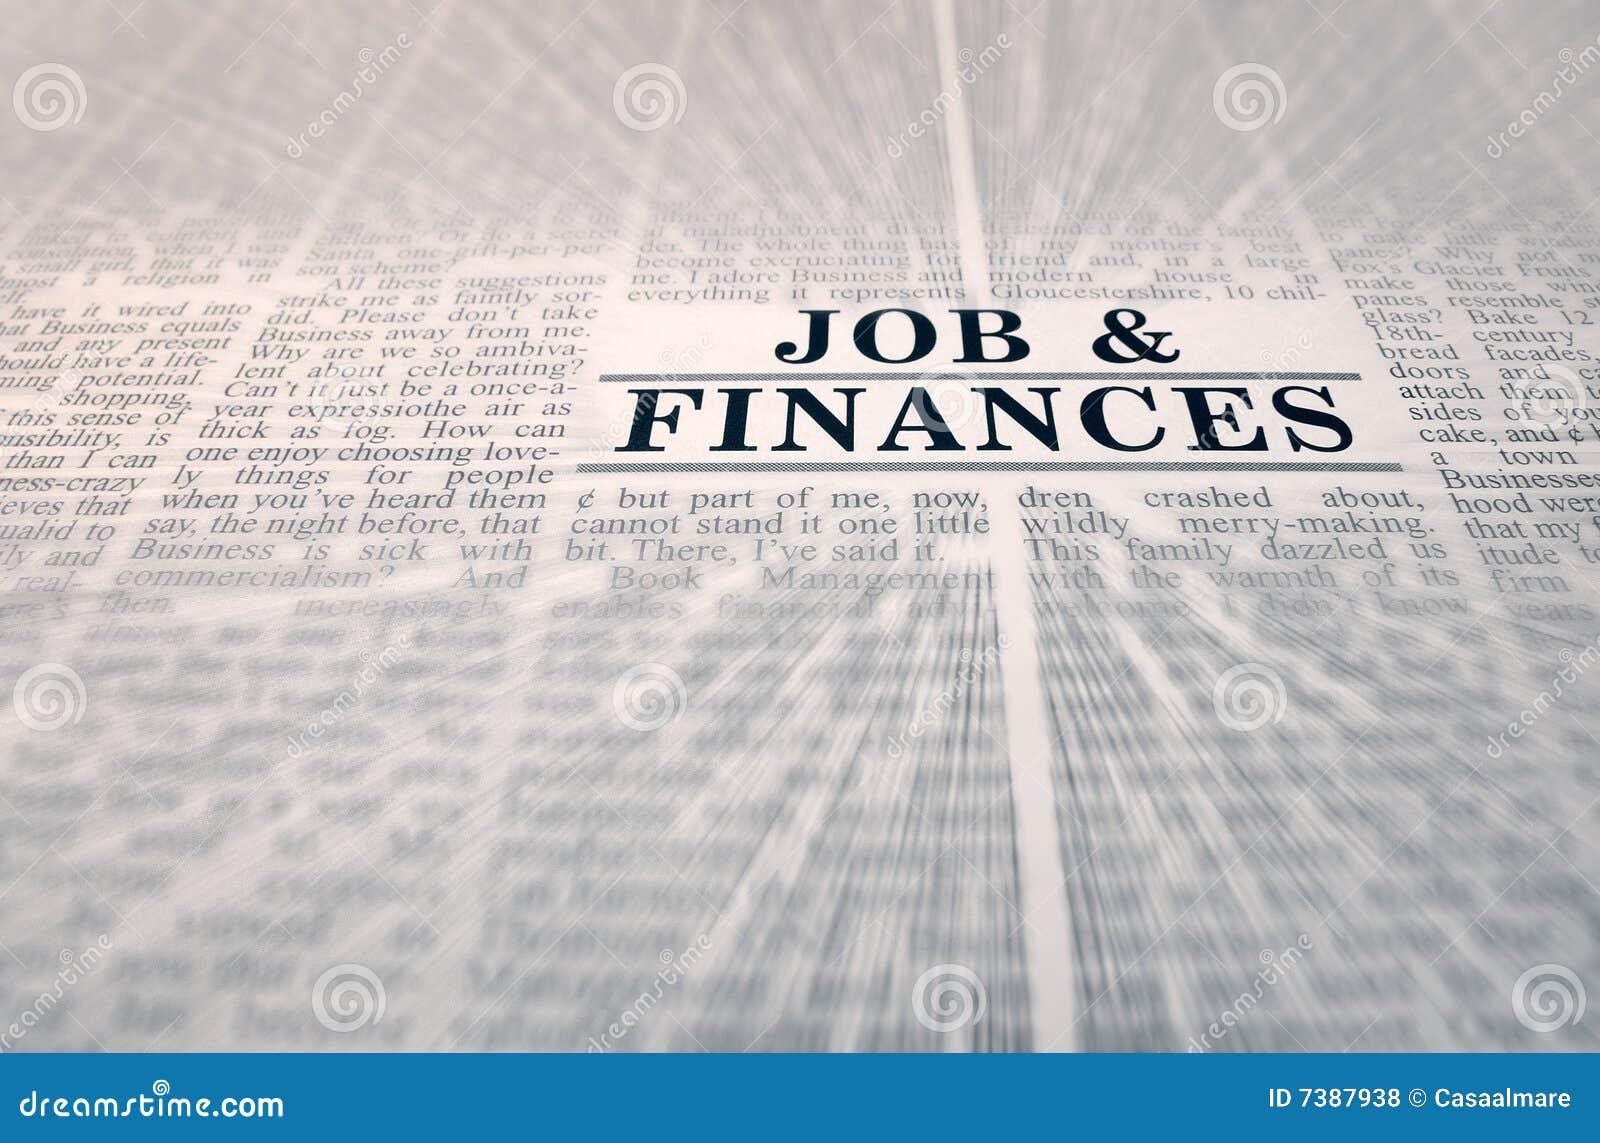 Job & finances